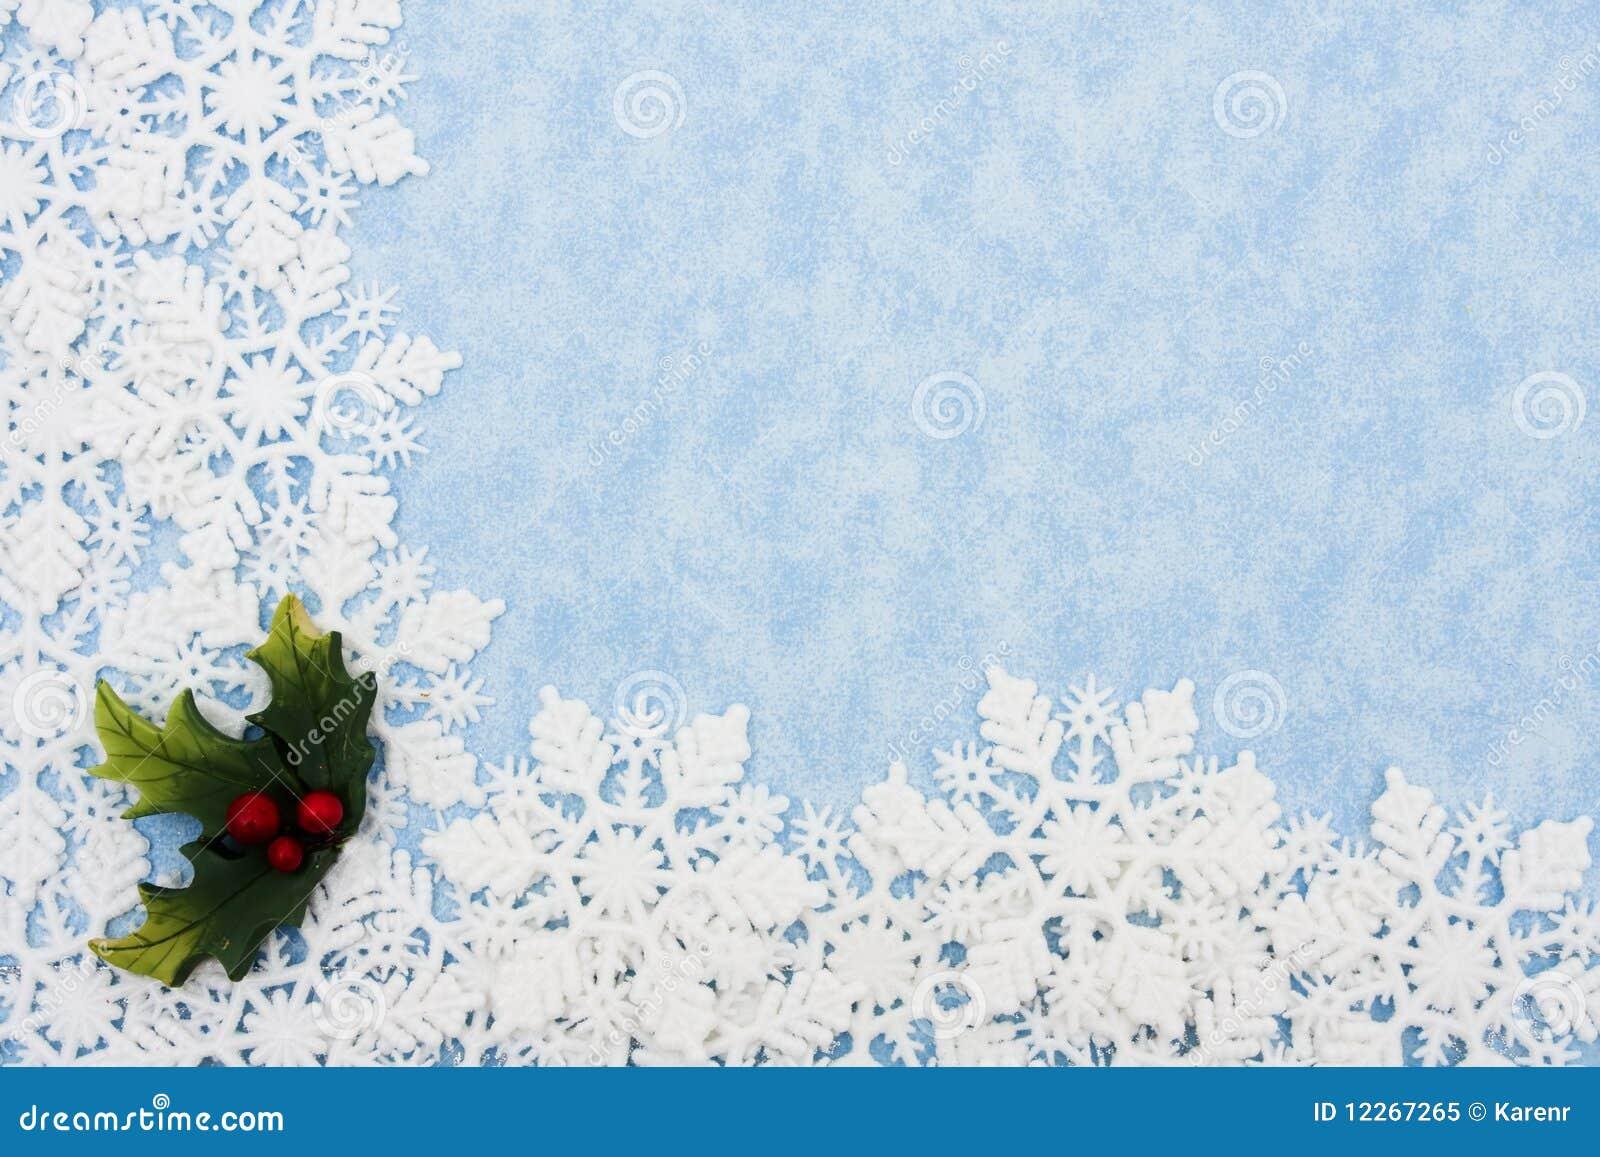 Snowflake Border Royalty Free Stock Photo - Image: 12267265